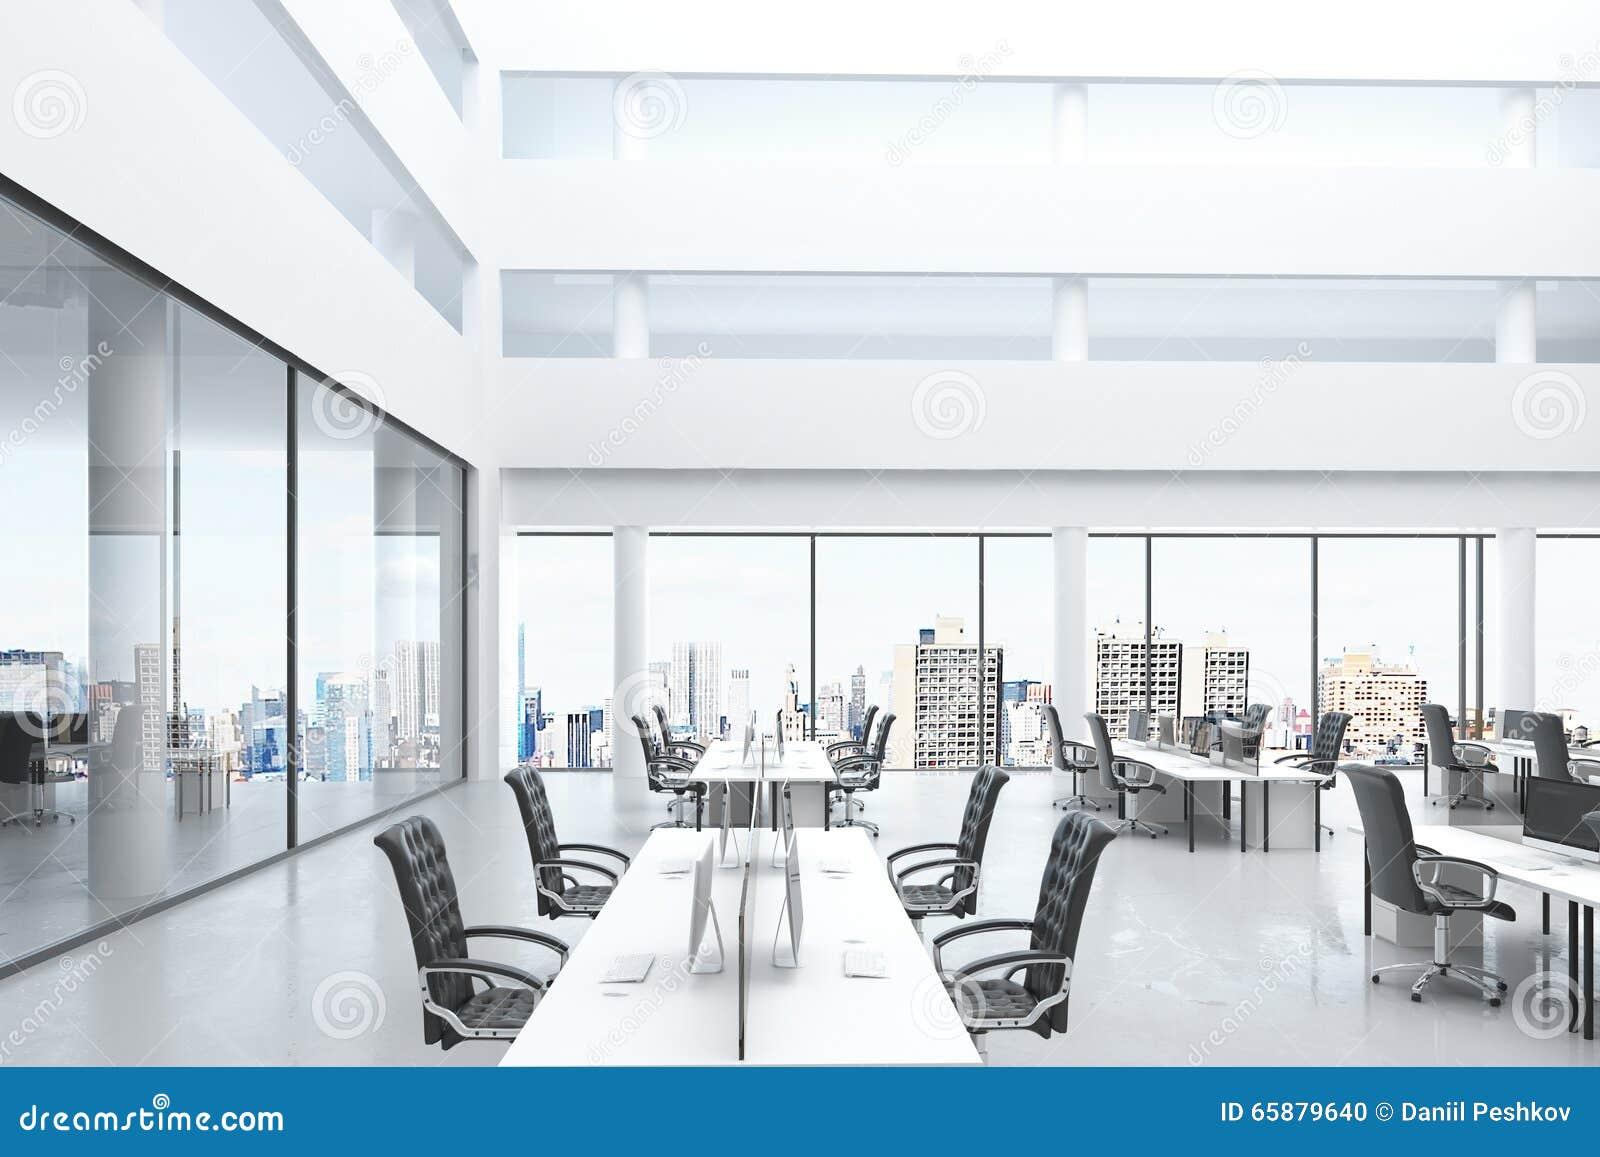 modern open space office with big windows and furniture stock illustration illustration of. Black Bedroom Furniture Sets. Home Design Ideas